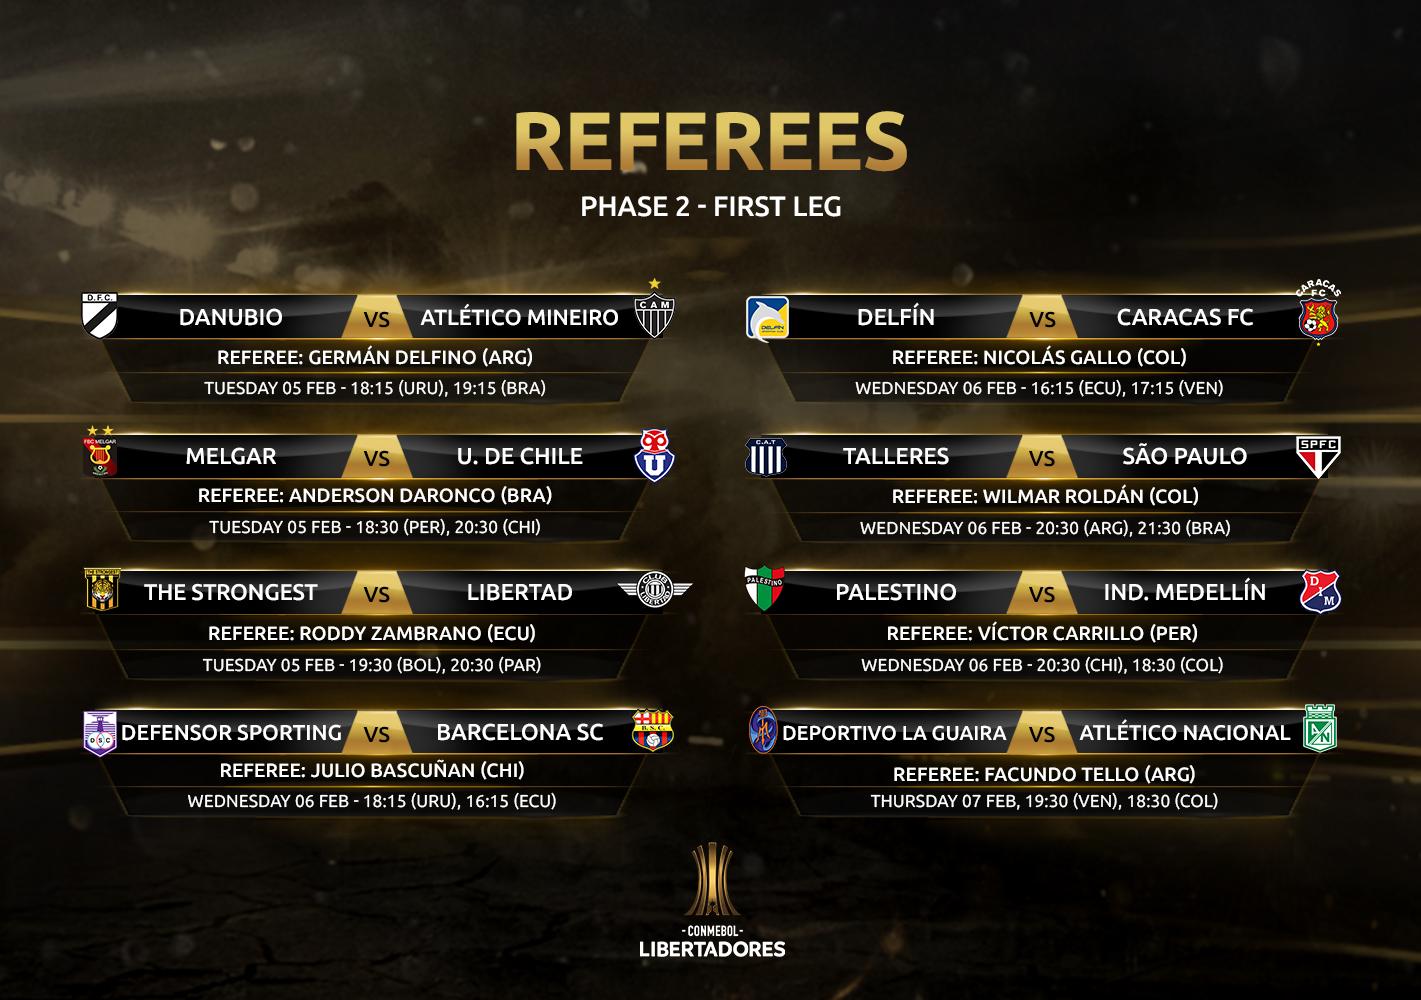 Referees 1st leg, Phase 2